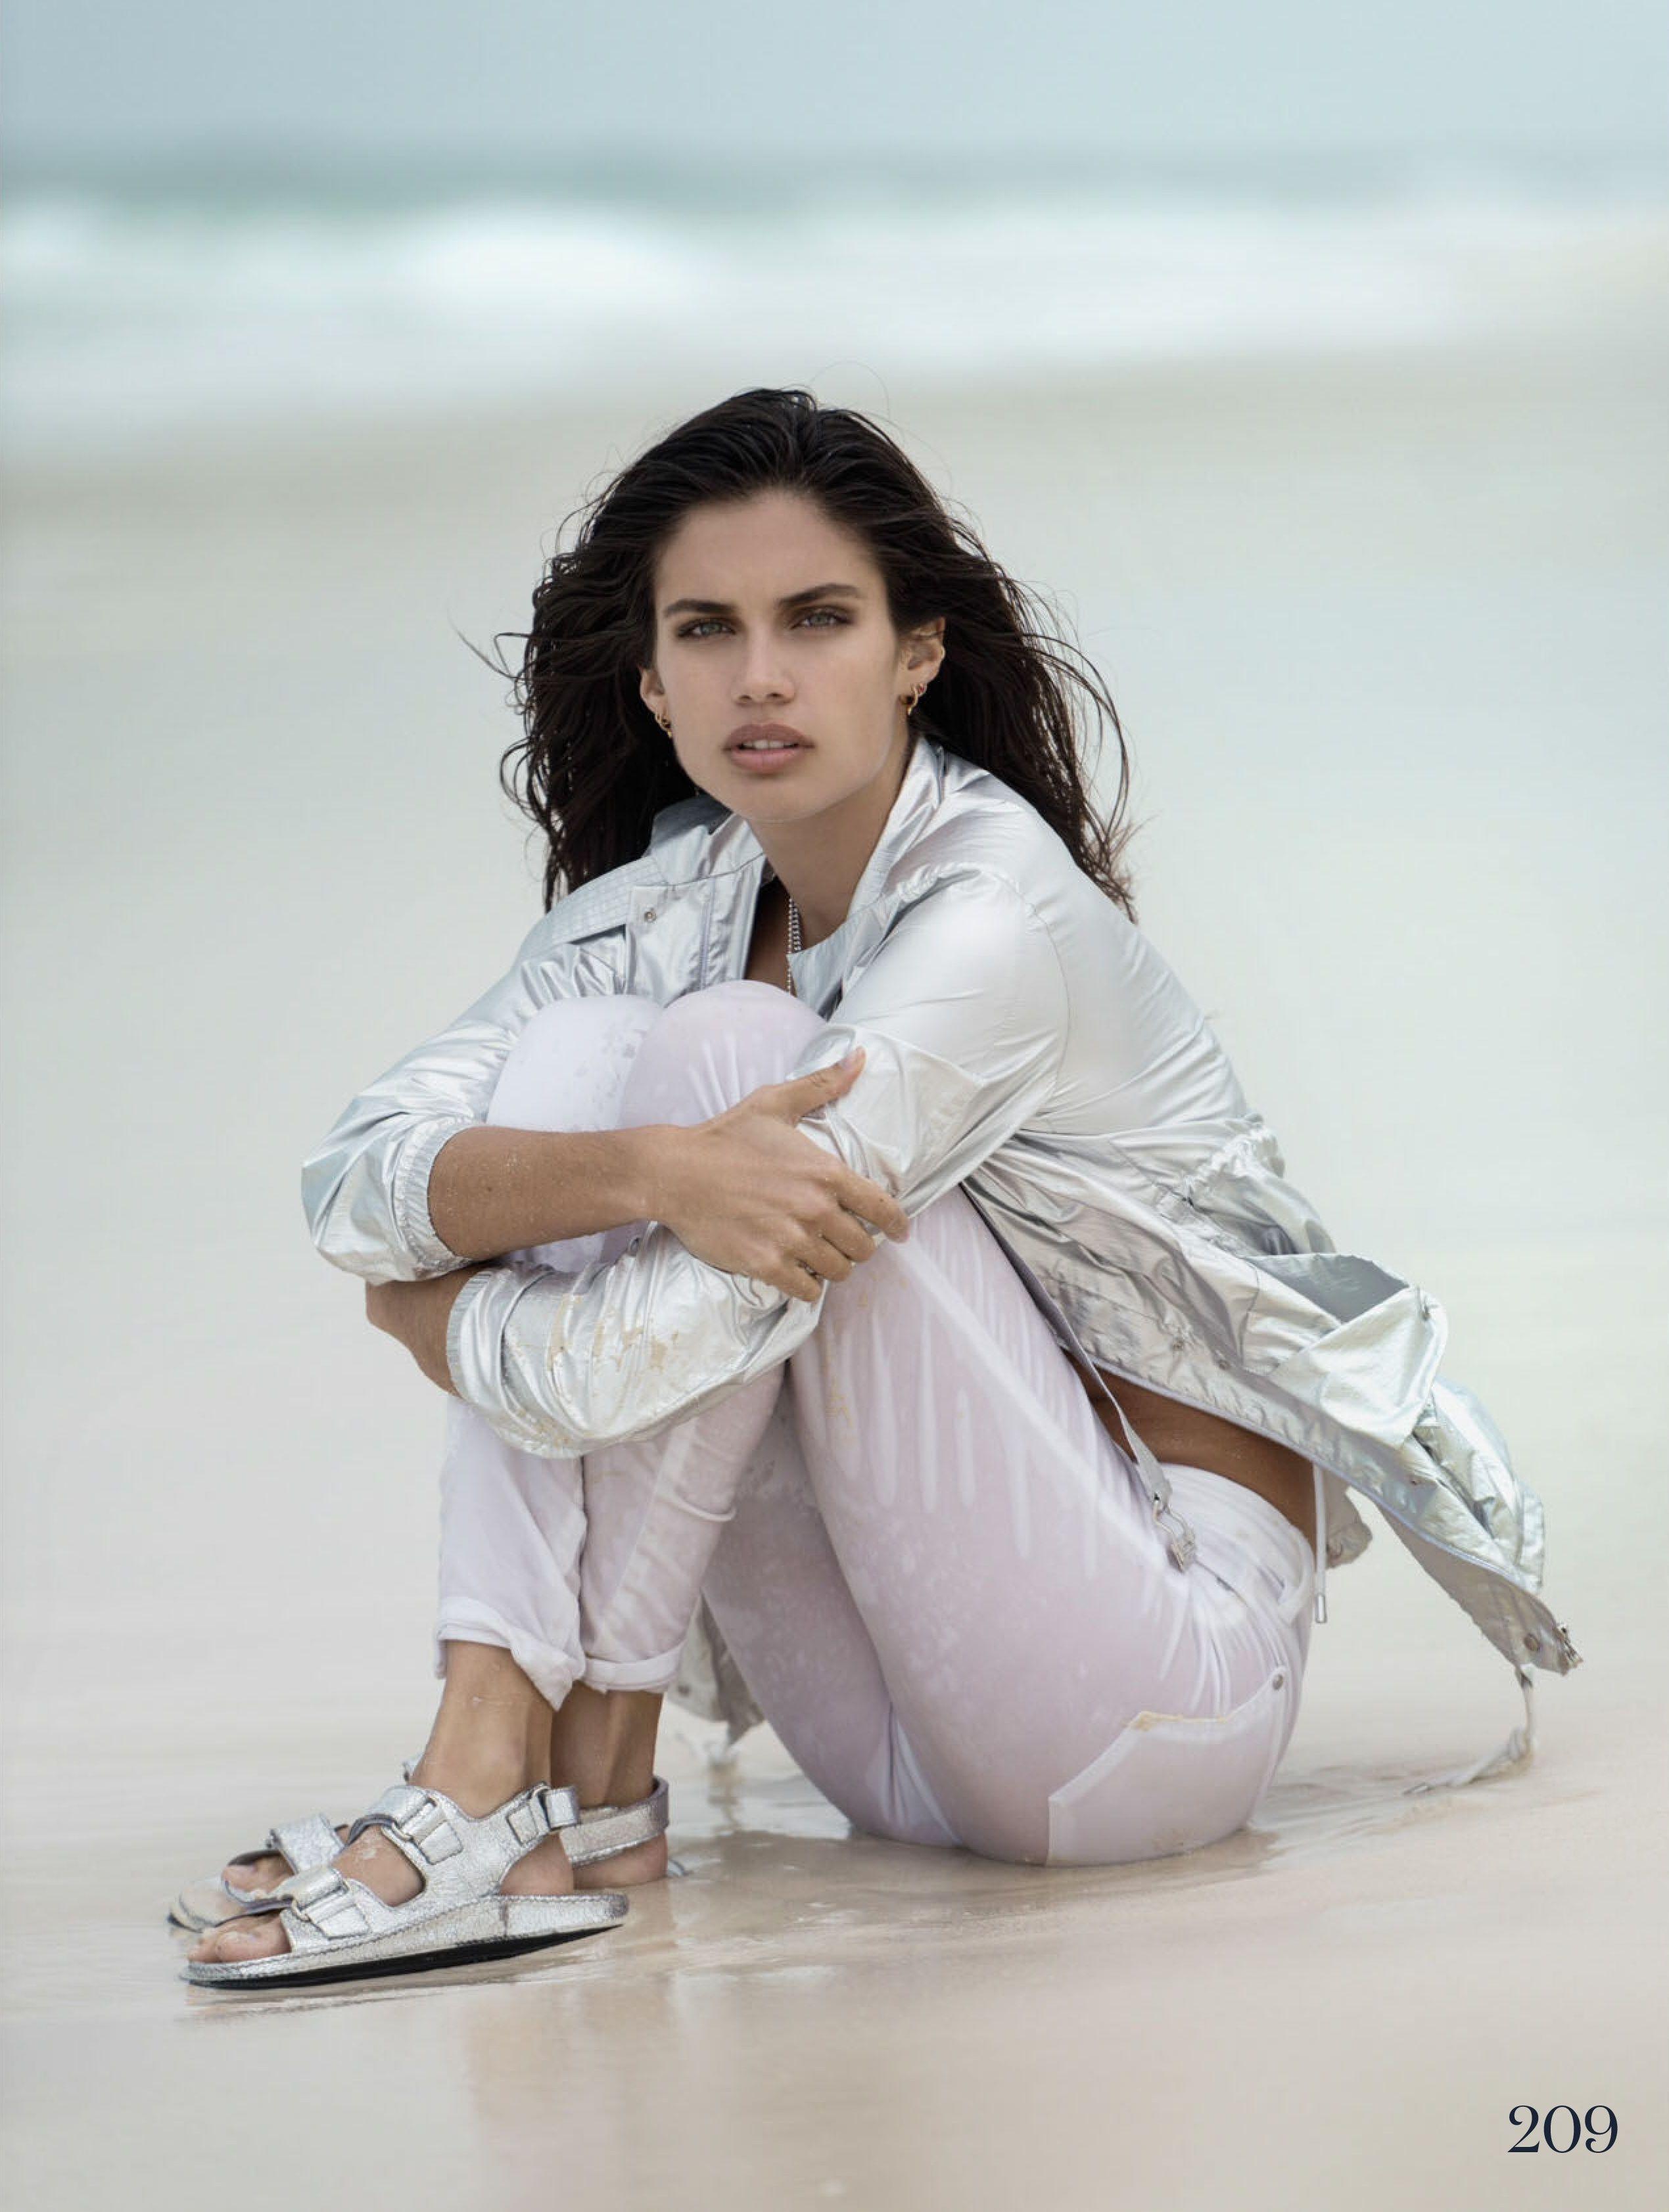 [CLIP] Model Sara Sampaio Hacked Pics • Fappening Sauce